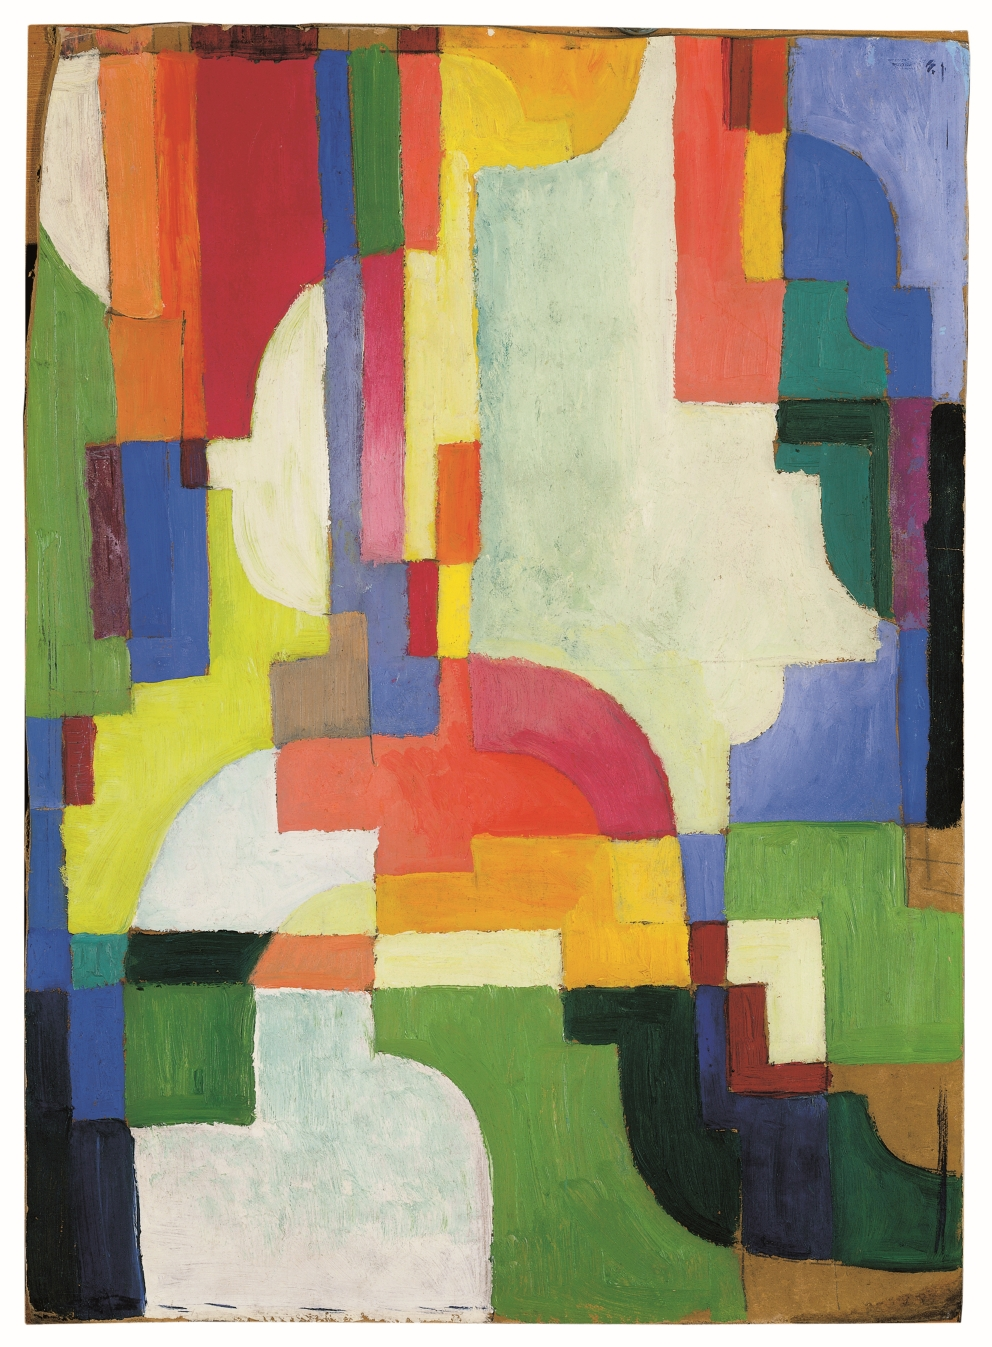 August Macke, Farbige Formen I, 1913, 67,5 × 53,0 cm; Münster; © LWL Foto: Sabine Ahlbrand-Dornseif